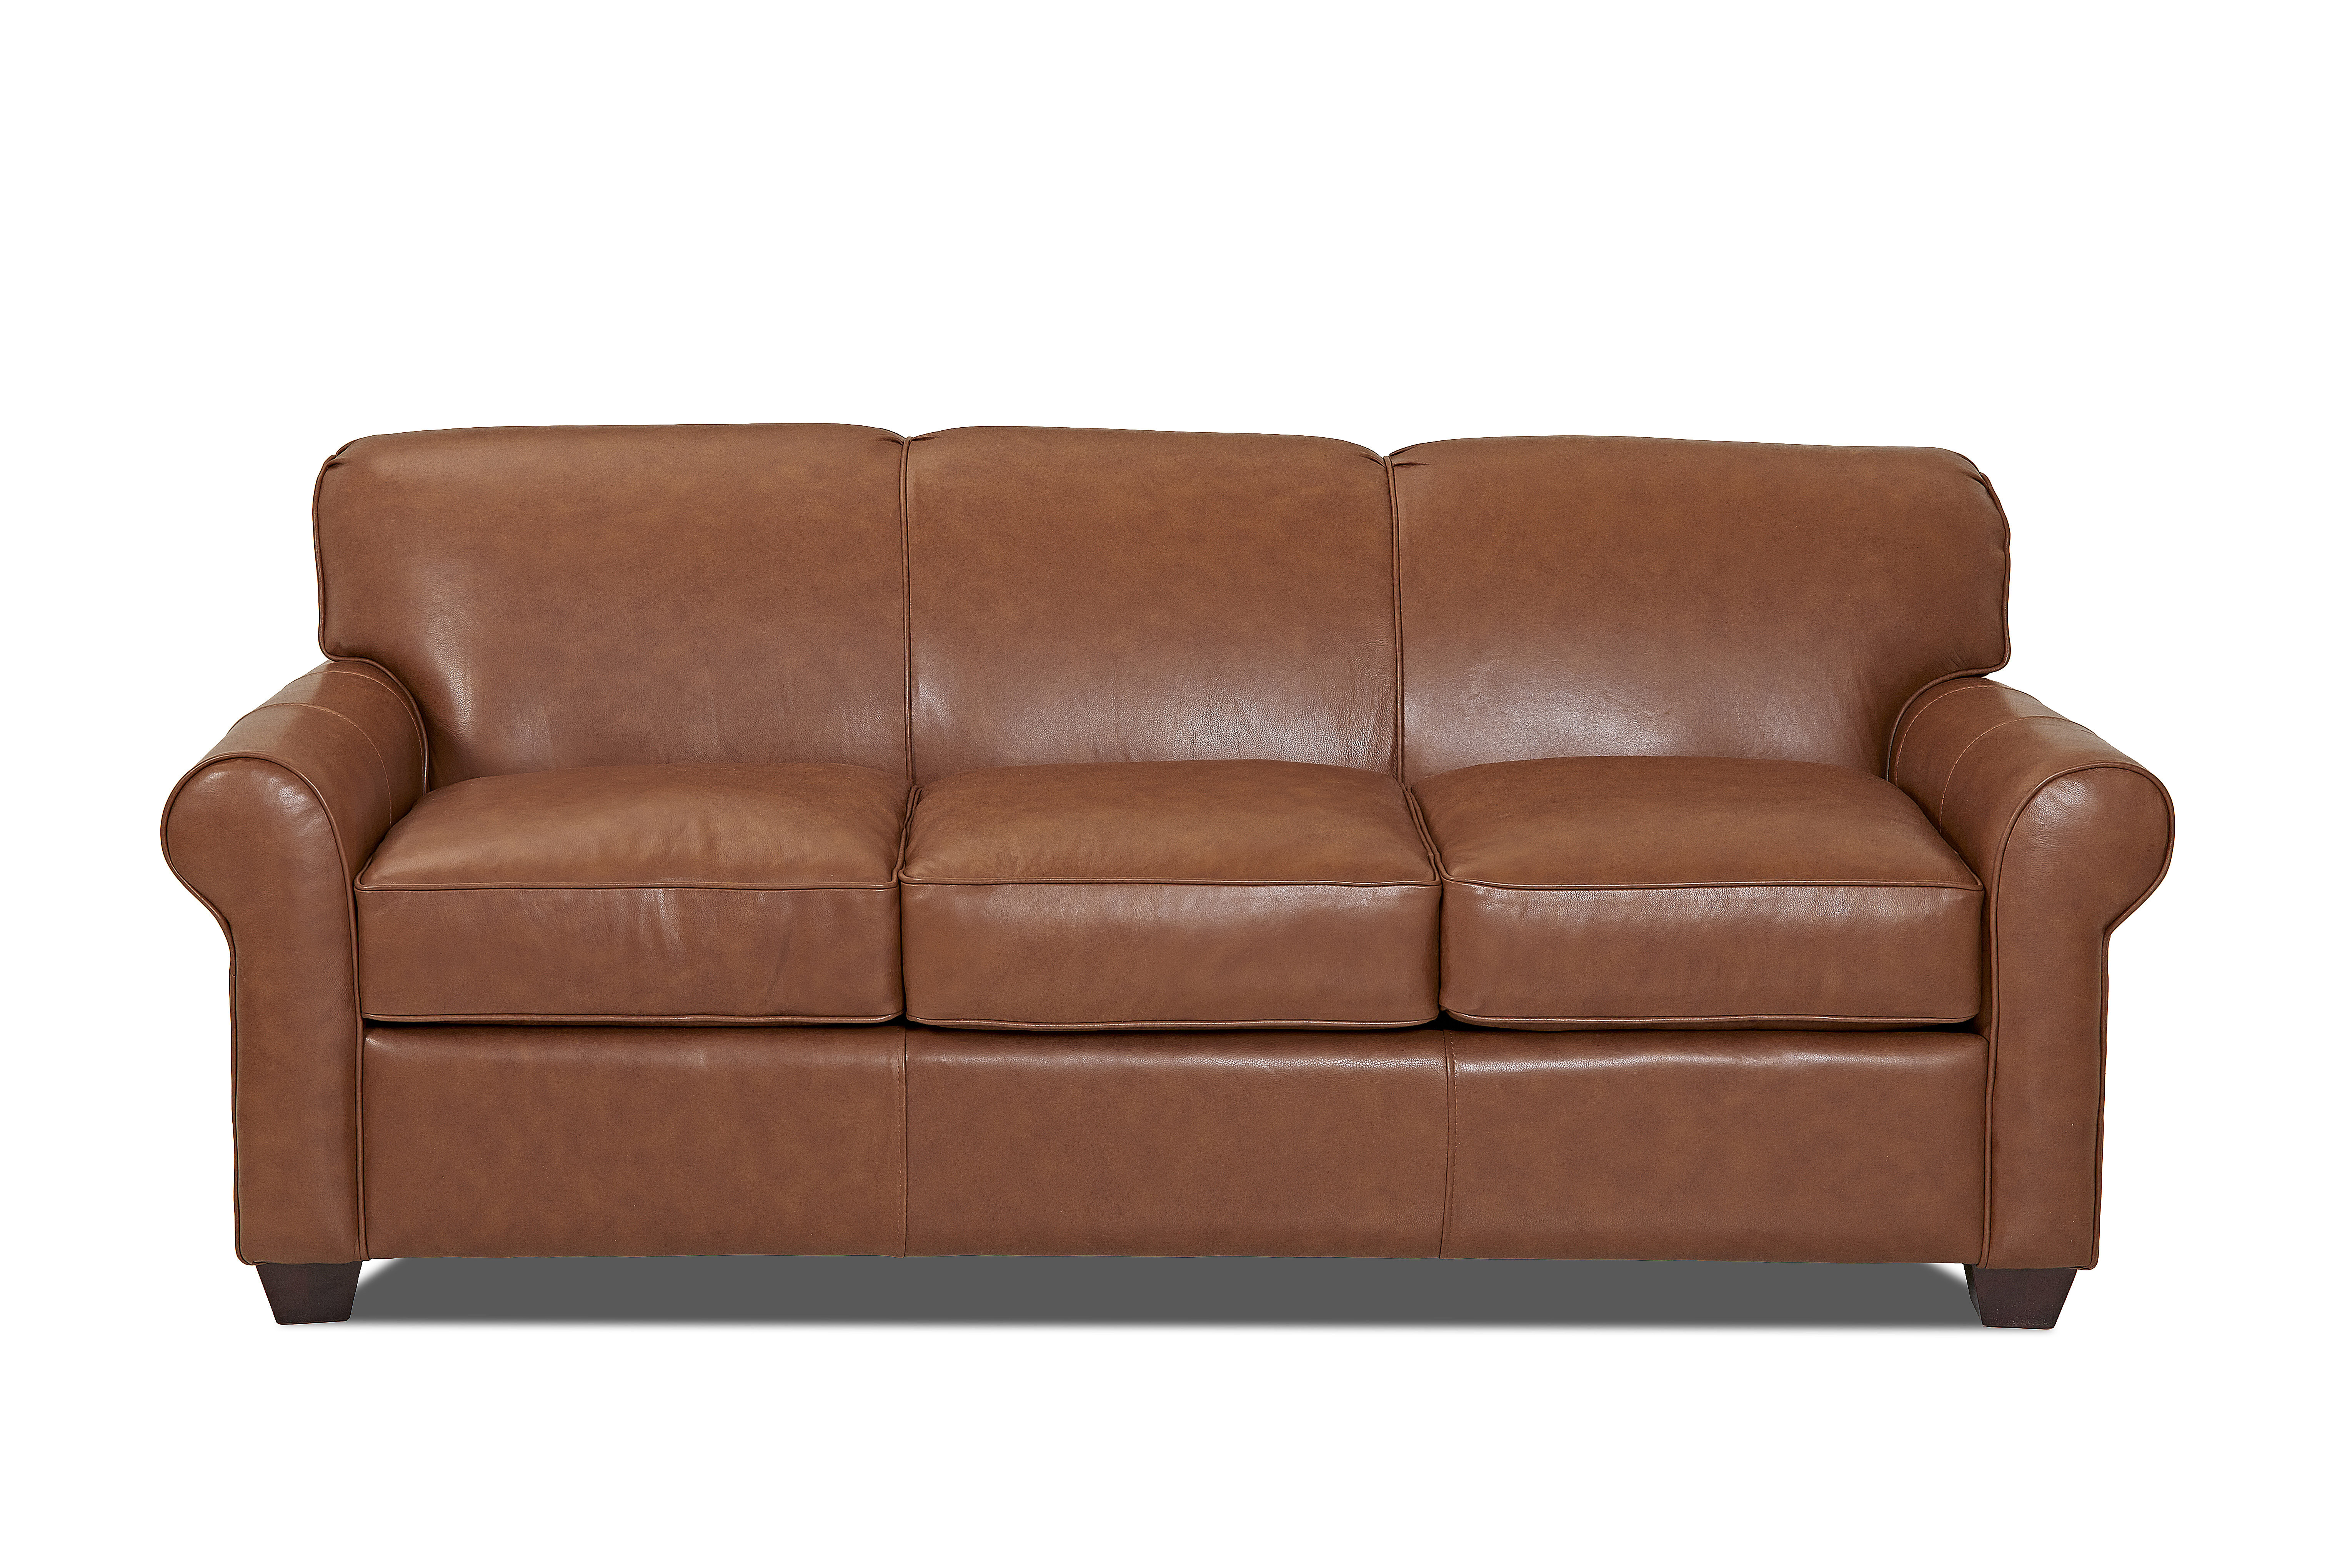 Wayfair Custom Upholstery™ Jennifer Leather Sofa & Reviews | Wayfair